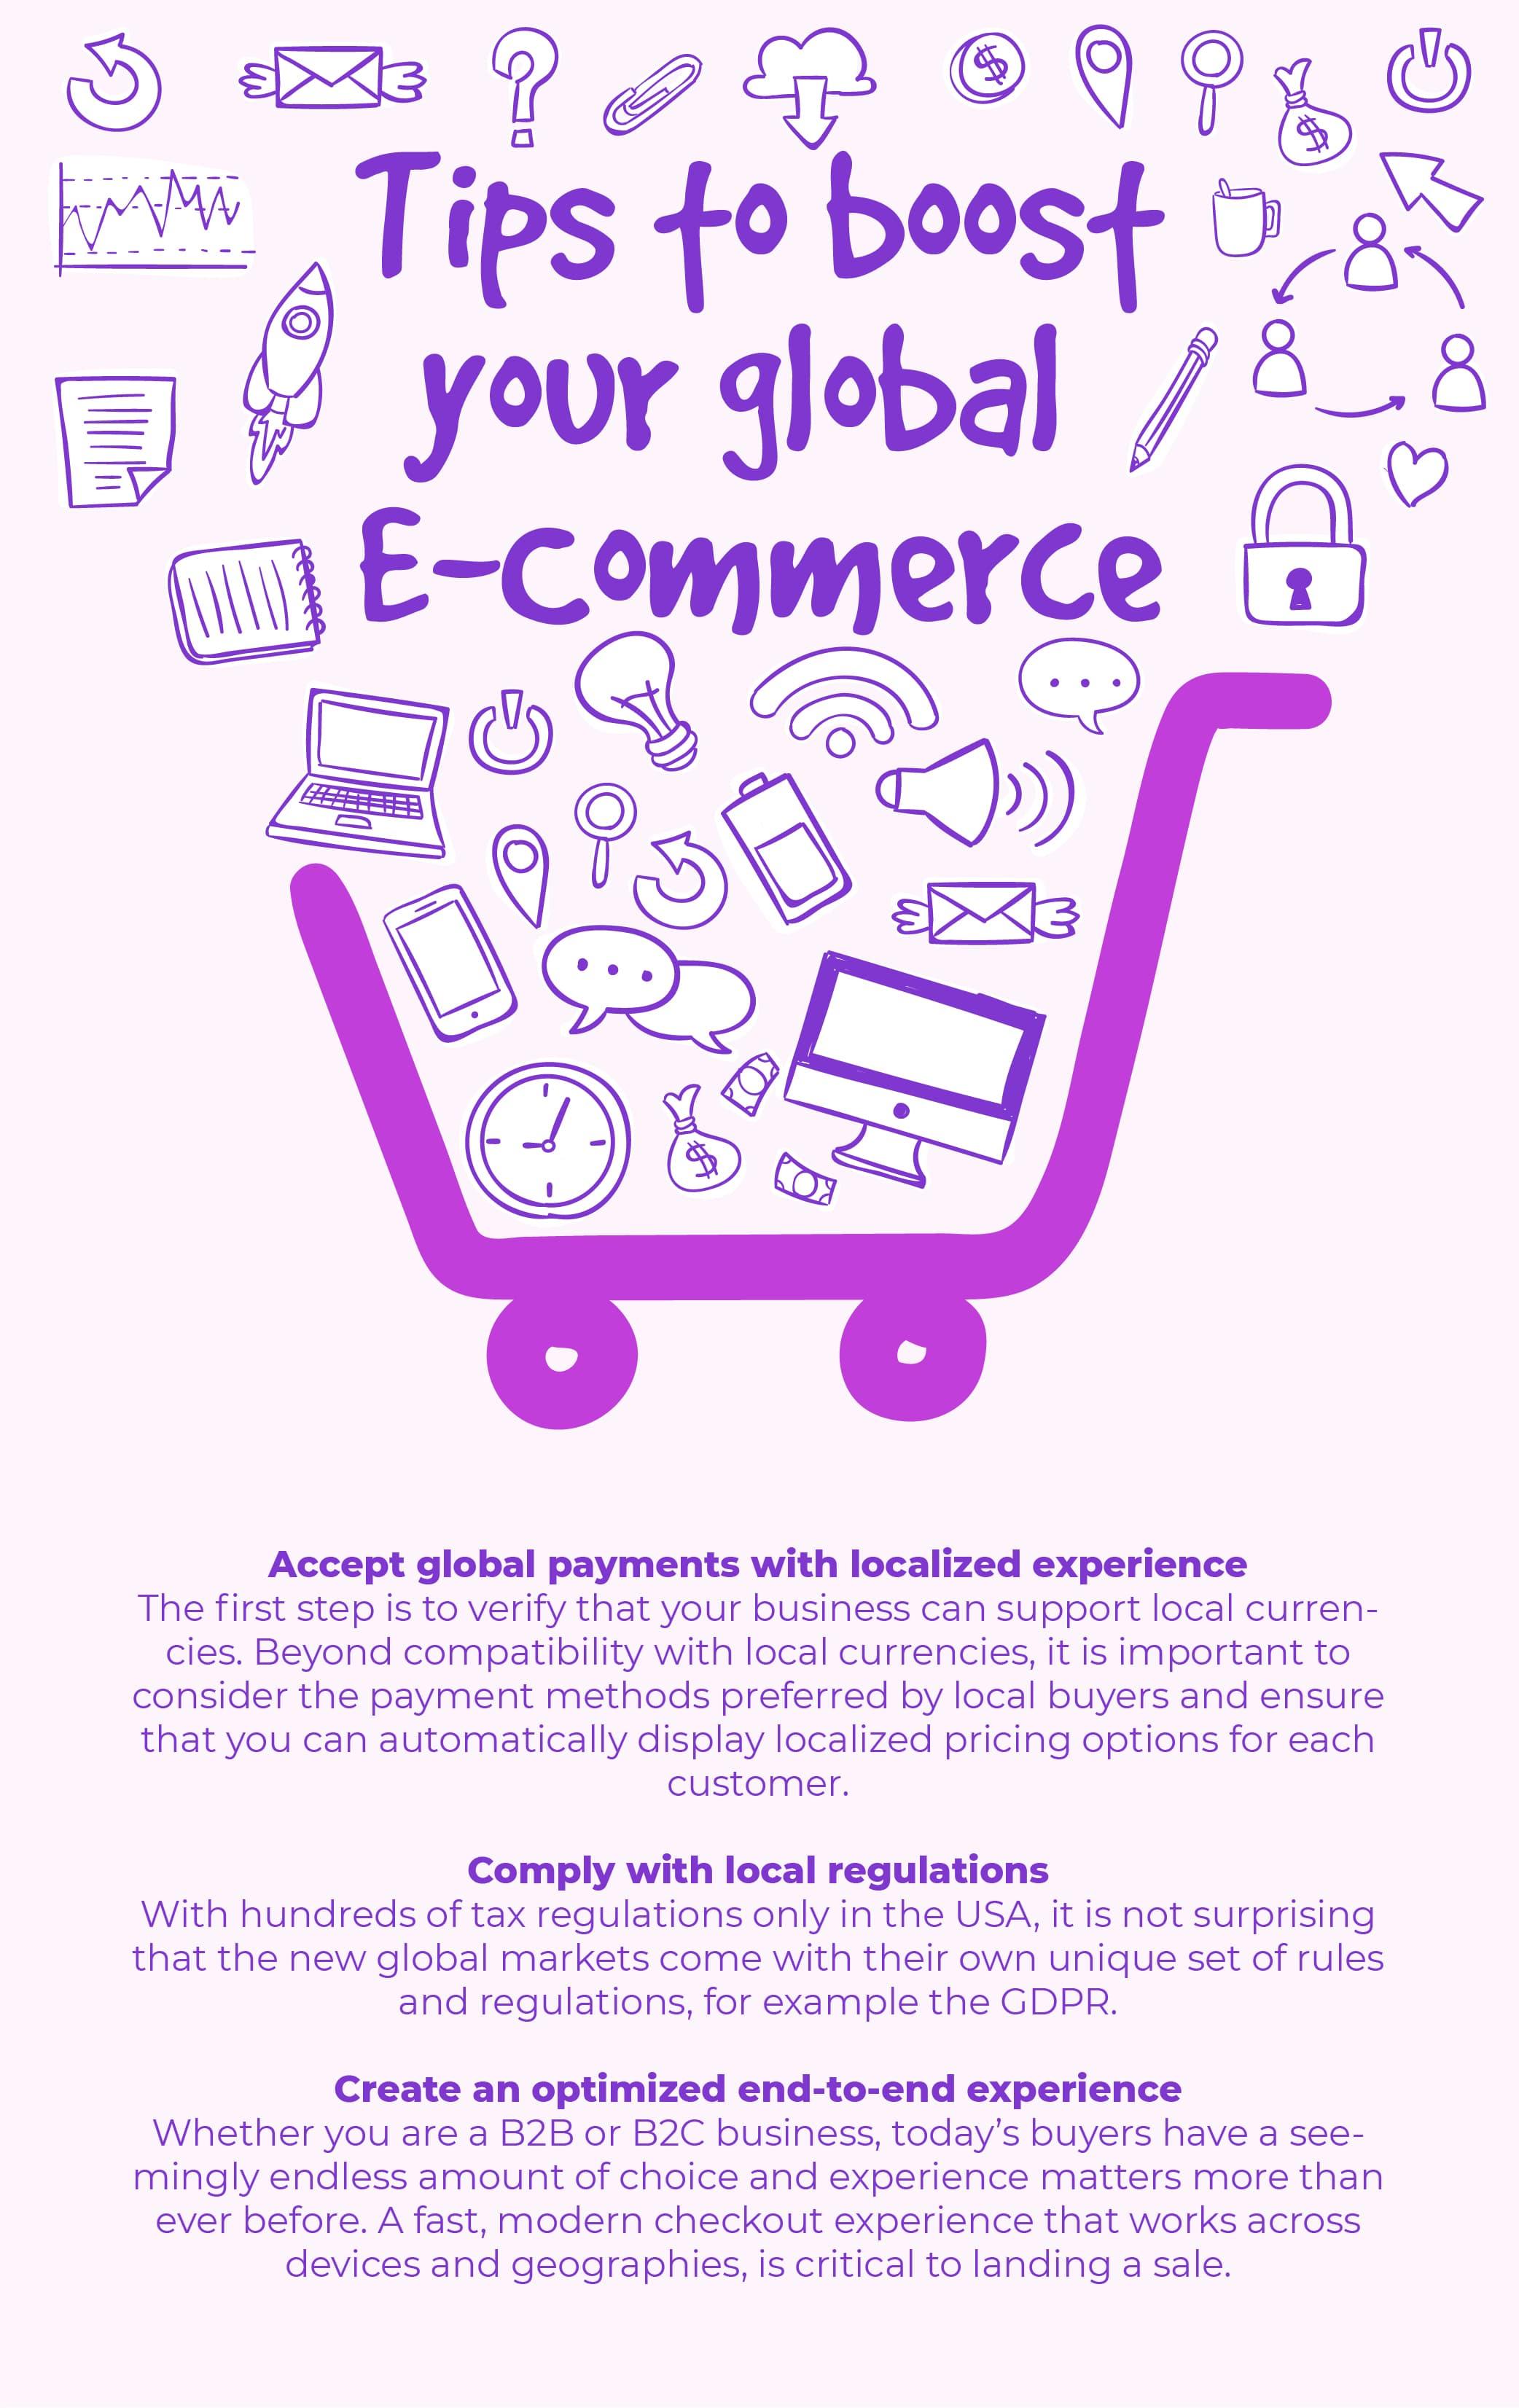 E-Commerce Virtual Mobile Infographic Image